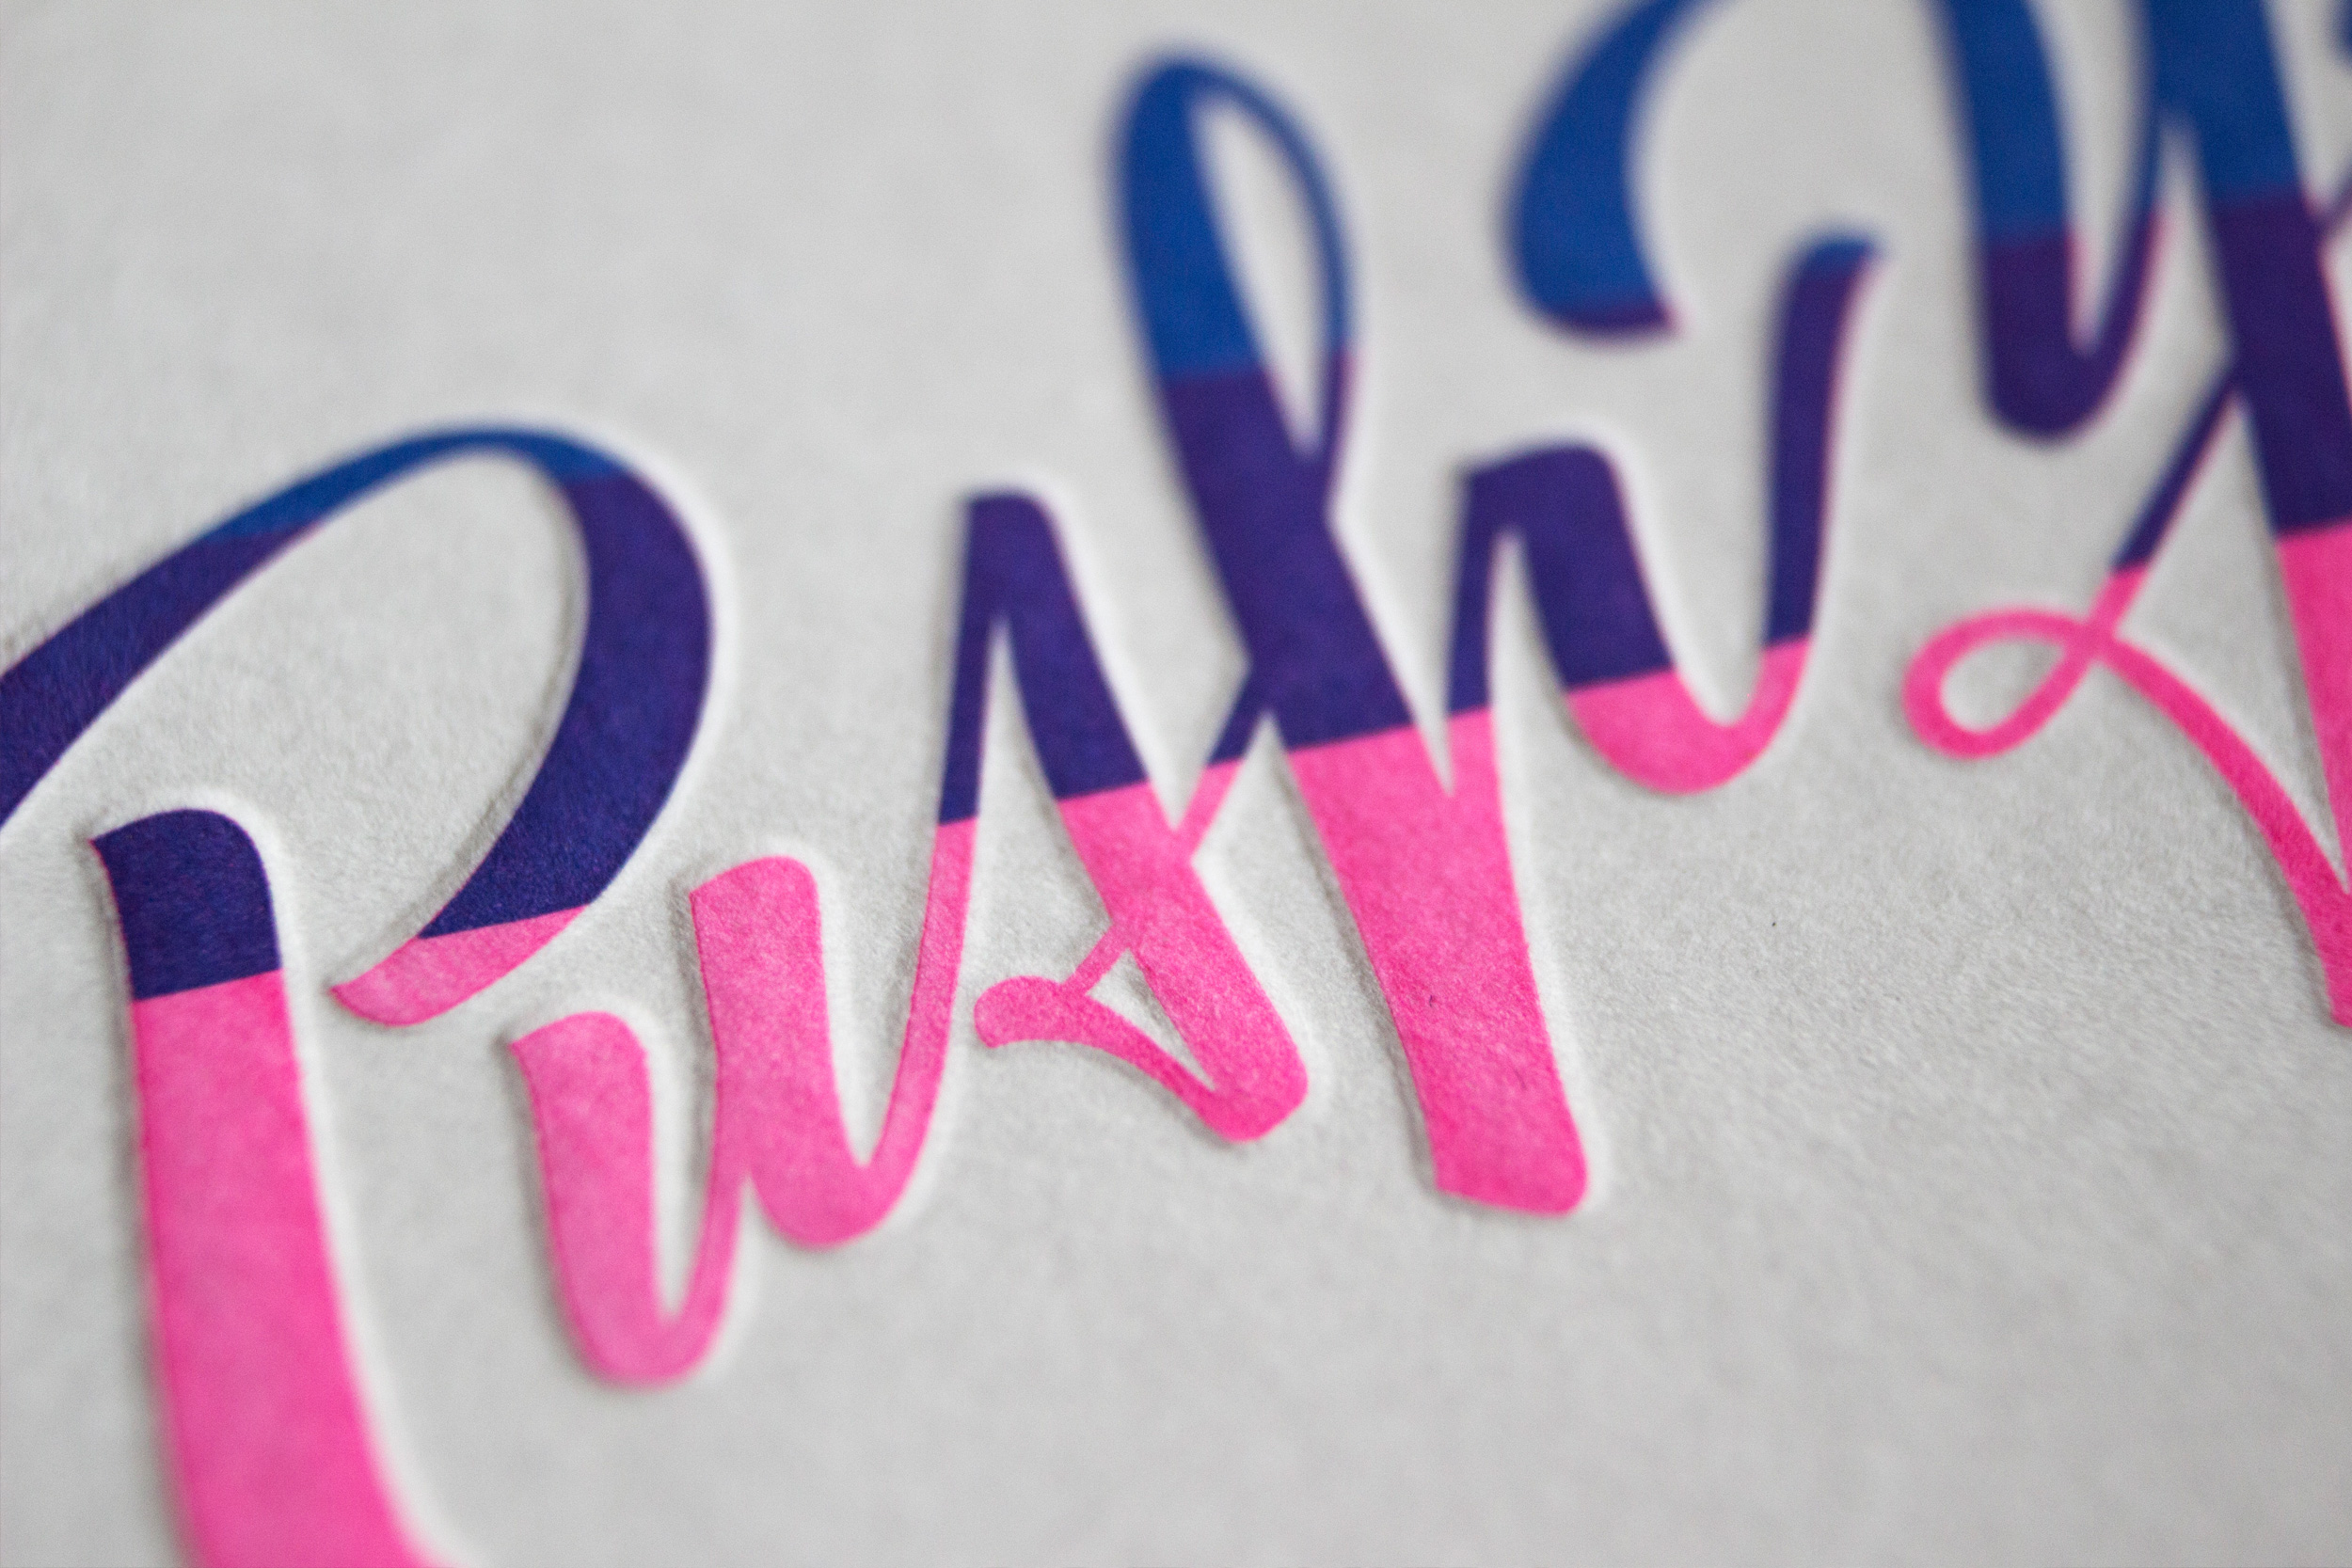 postales-guilleyyani-papel-principal-letterpress-imprenta-tipografica-1.jpg